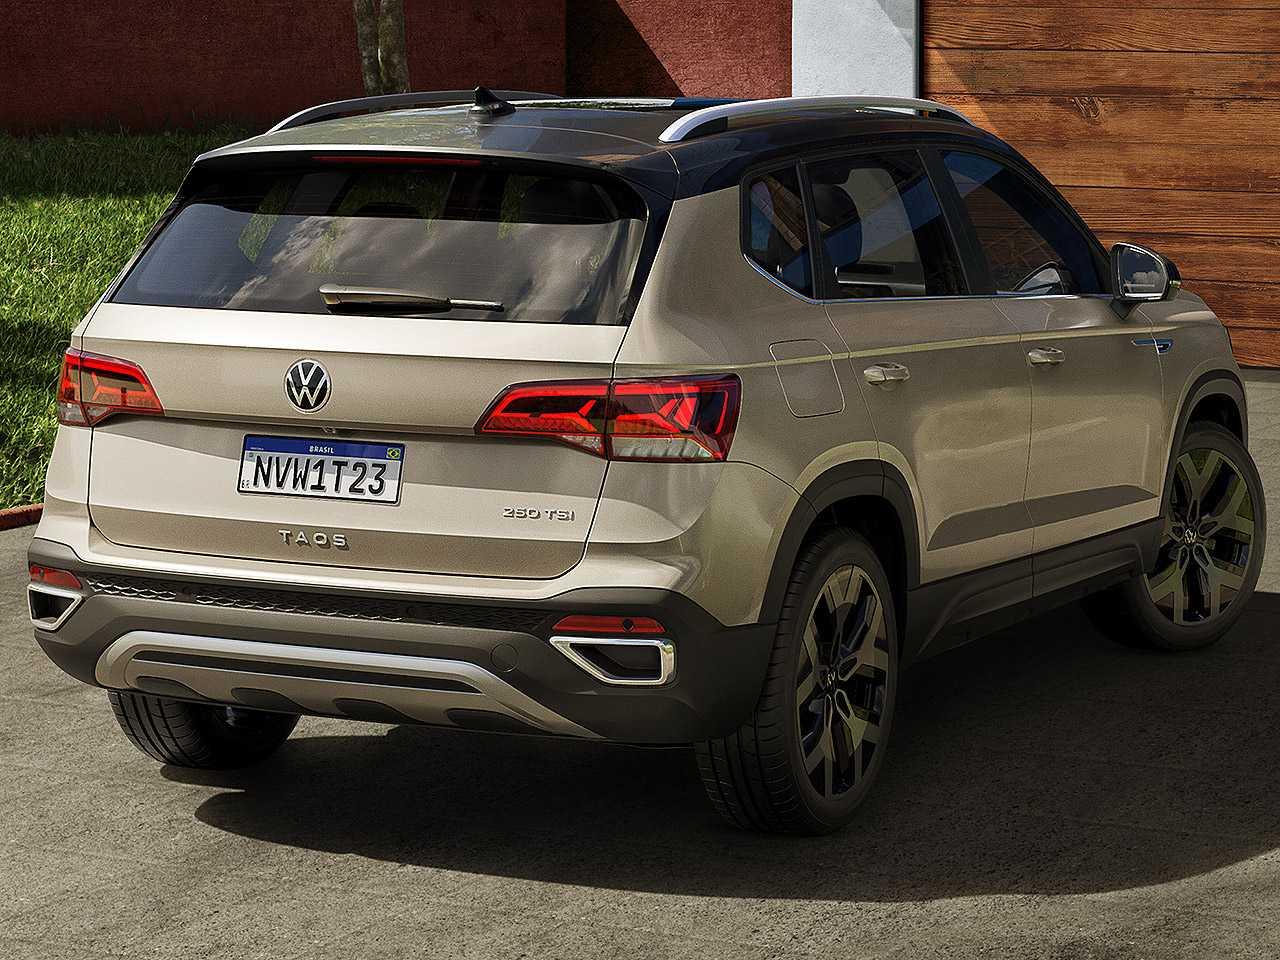 VolkswagenTaos 2021 - ângulo traseiro